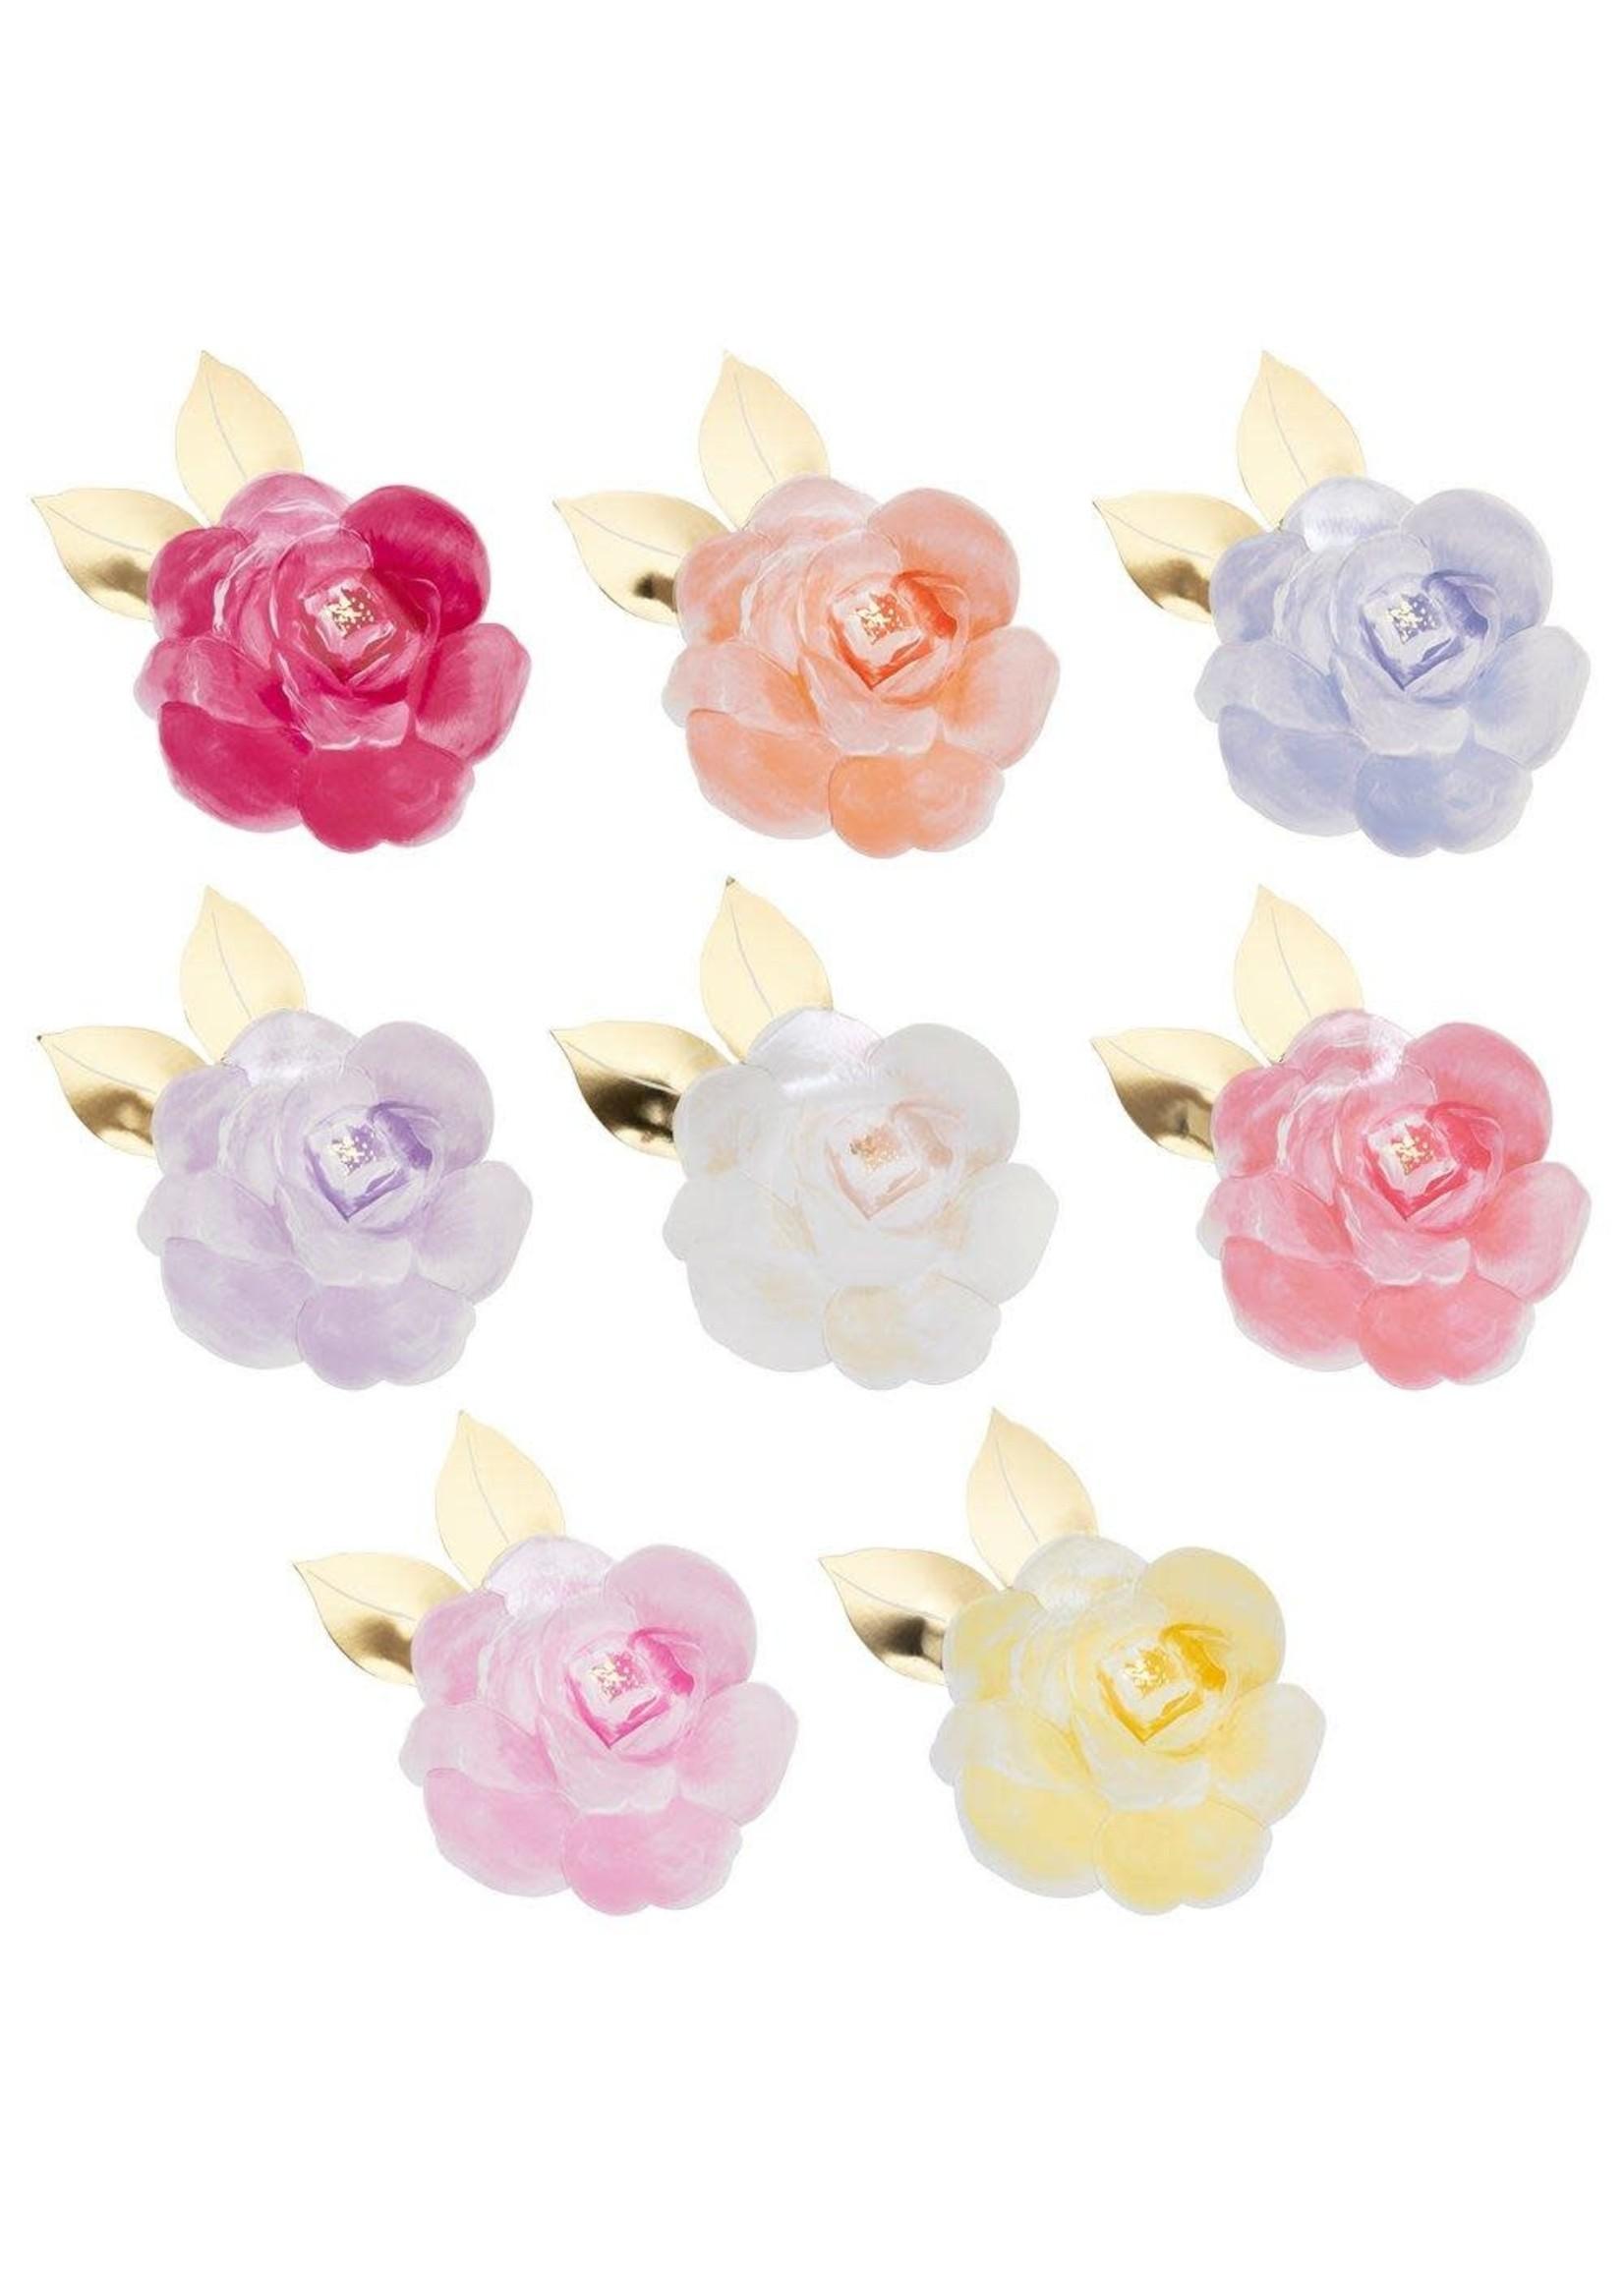 Meri Meri Paper Plates - Rose Garden (set of 8)